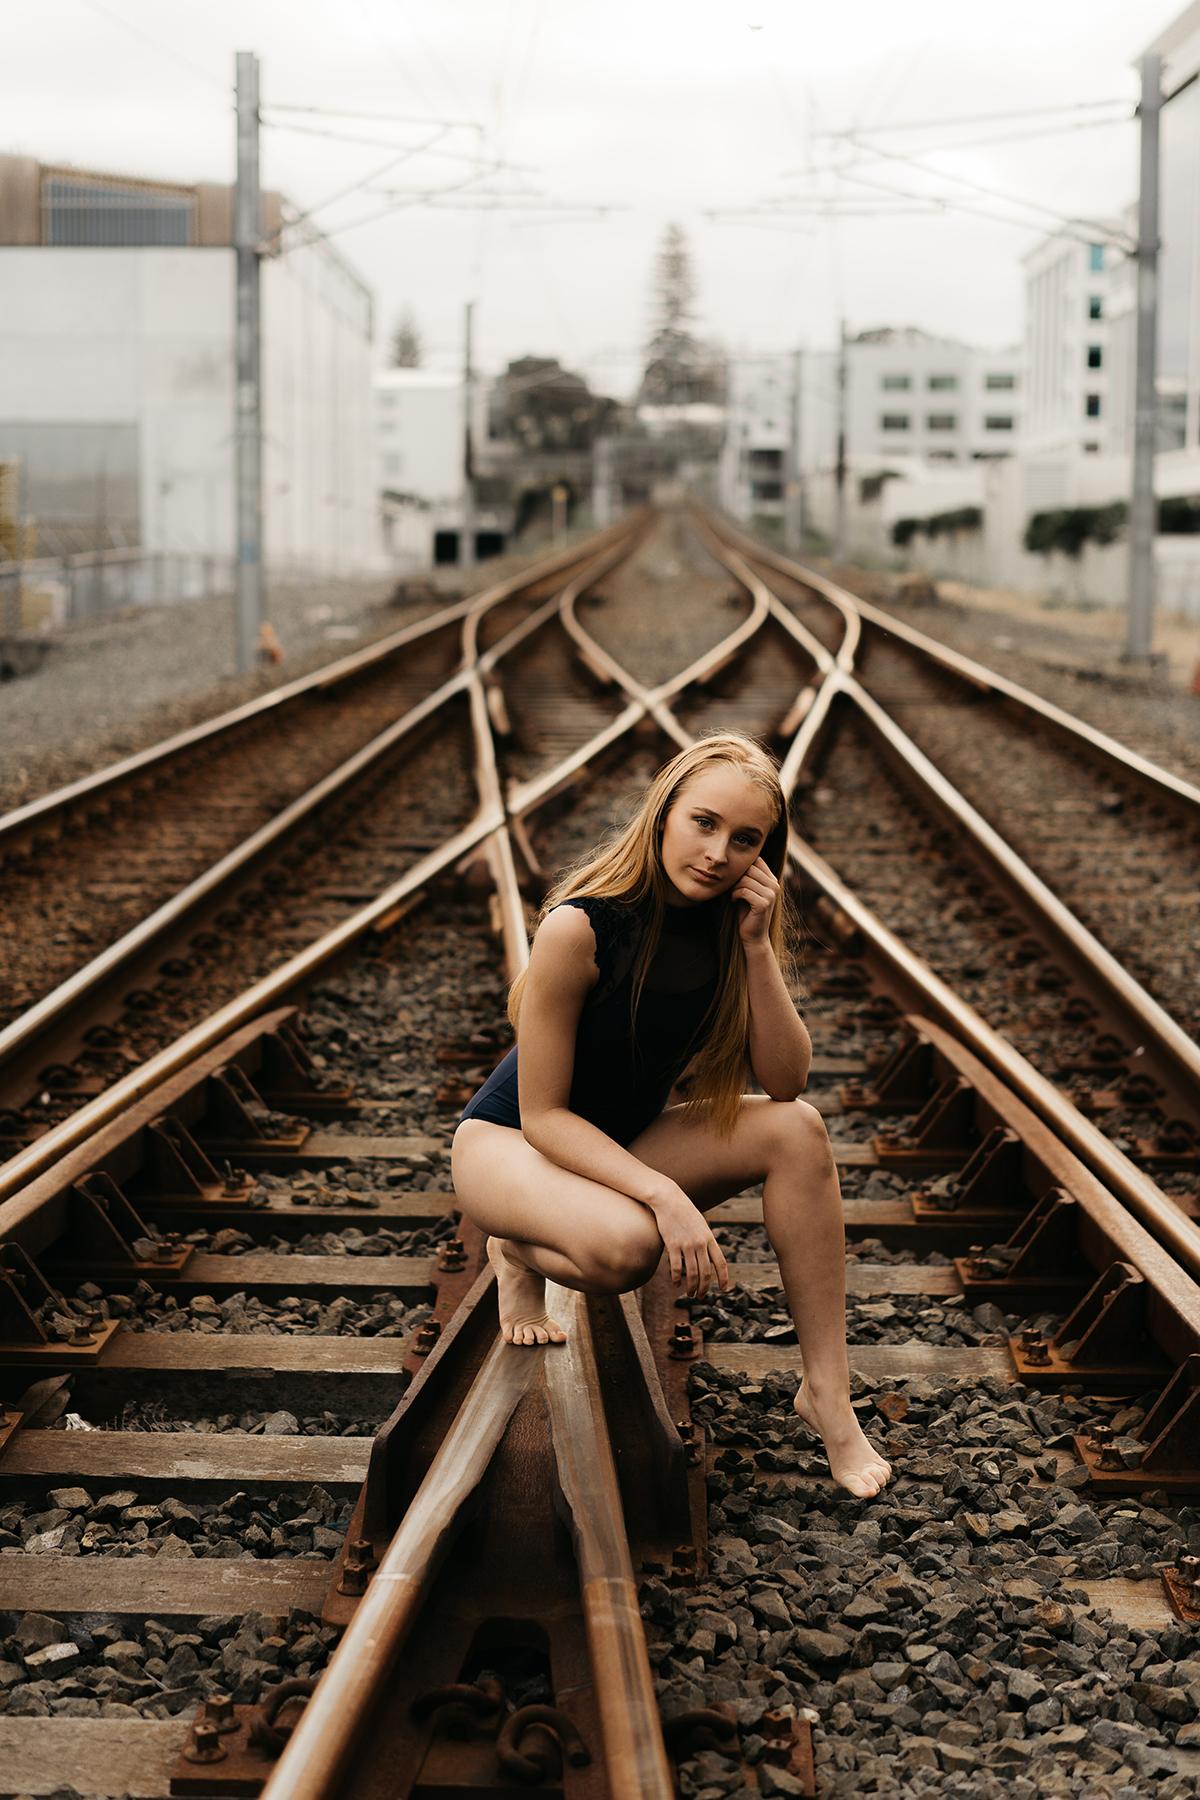 Keelia_Kennychickphotos-60.jpg